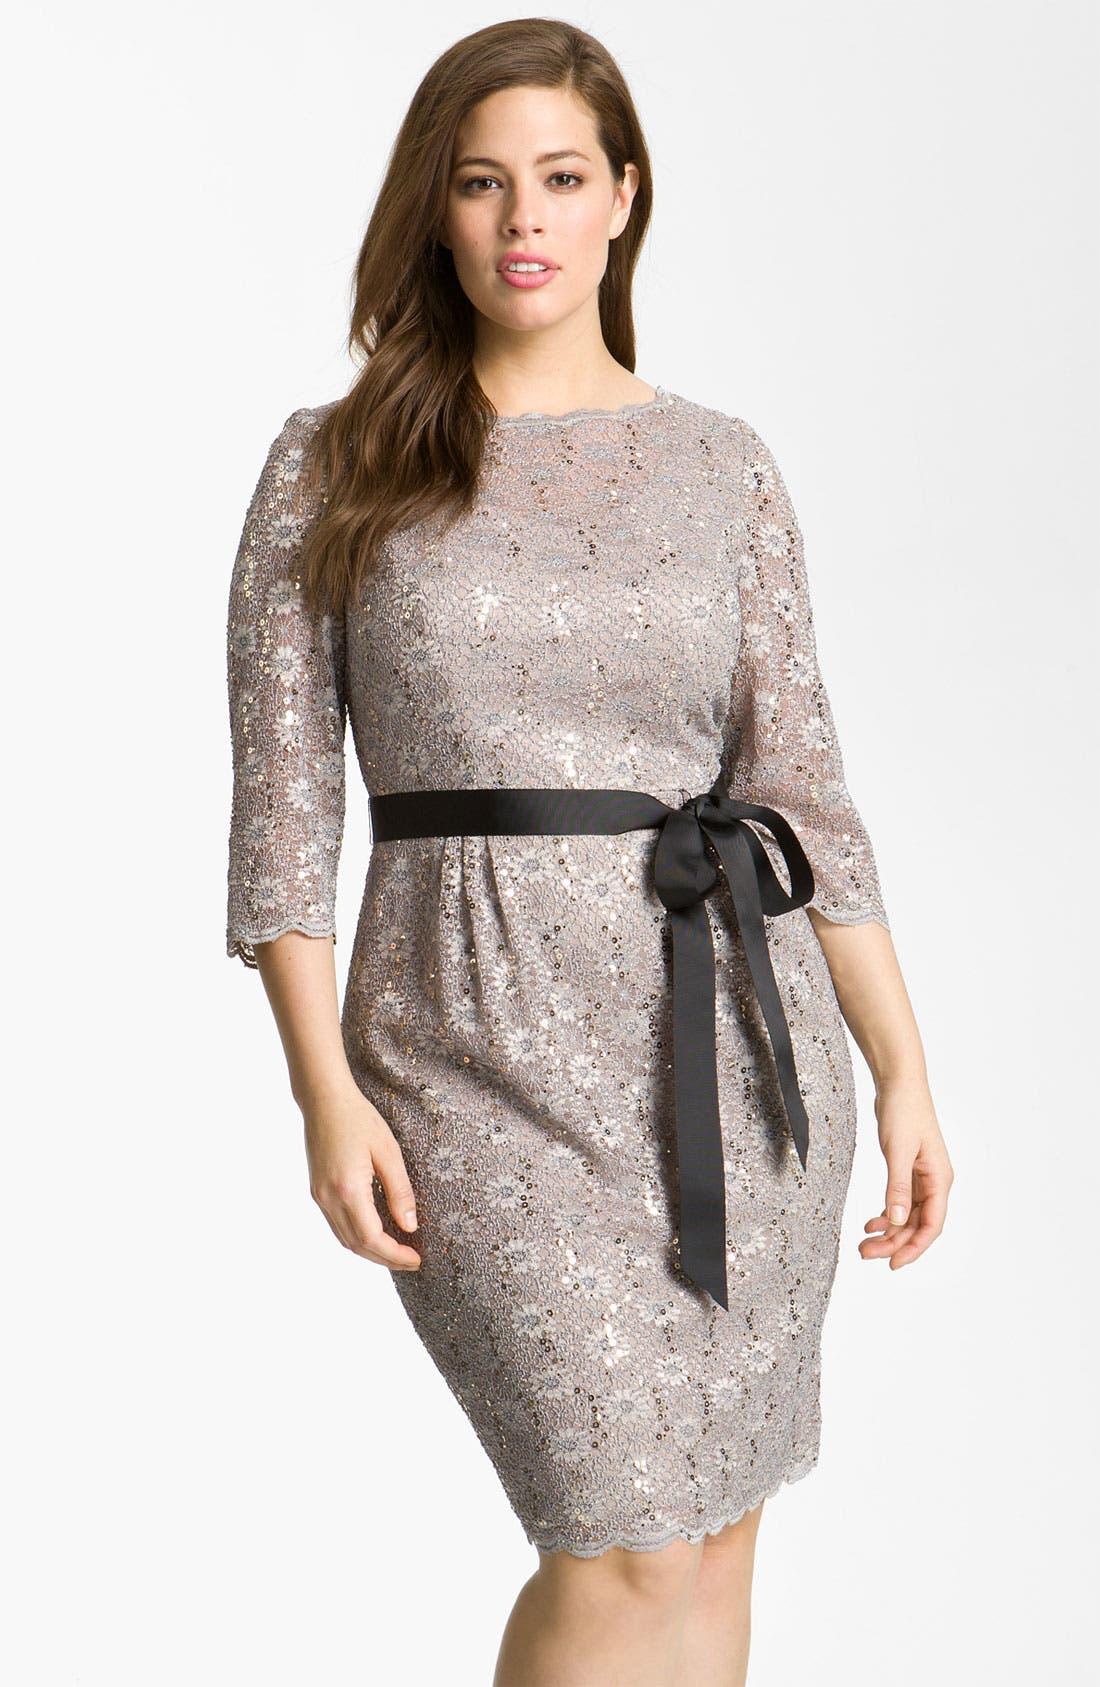 Alternate Image 1 Selected - Alex Evenings Sequin Lace Sheath Dress (Plus Size)